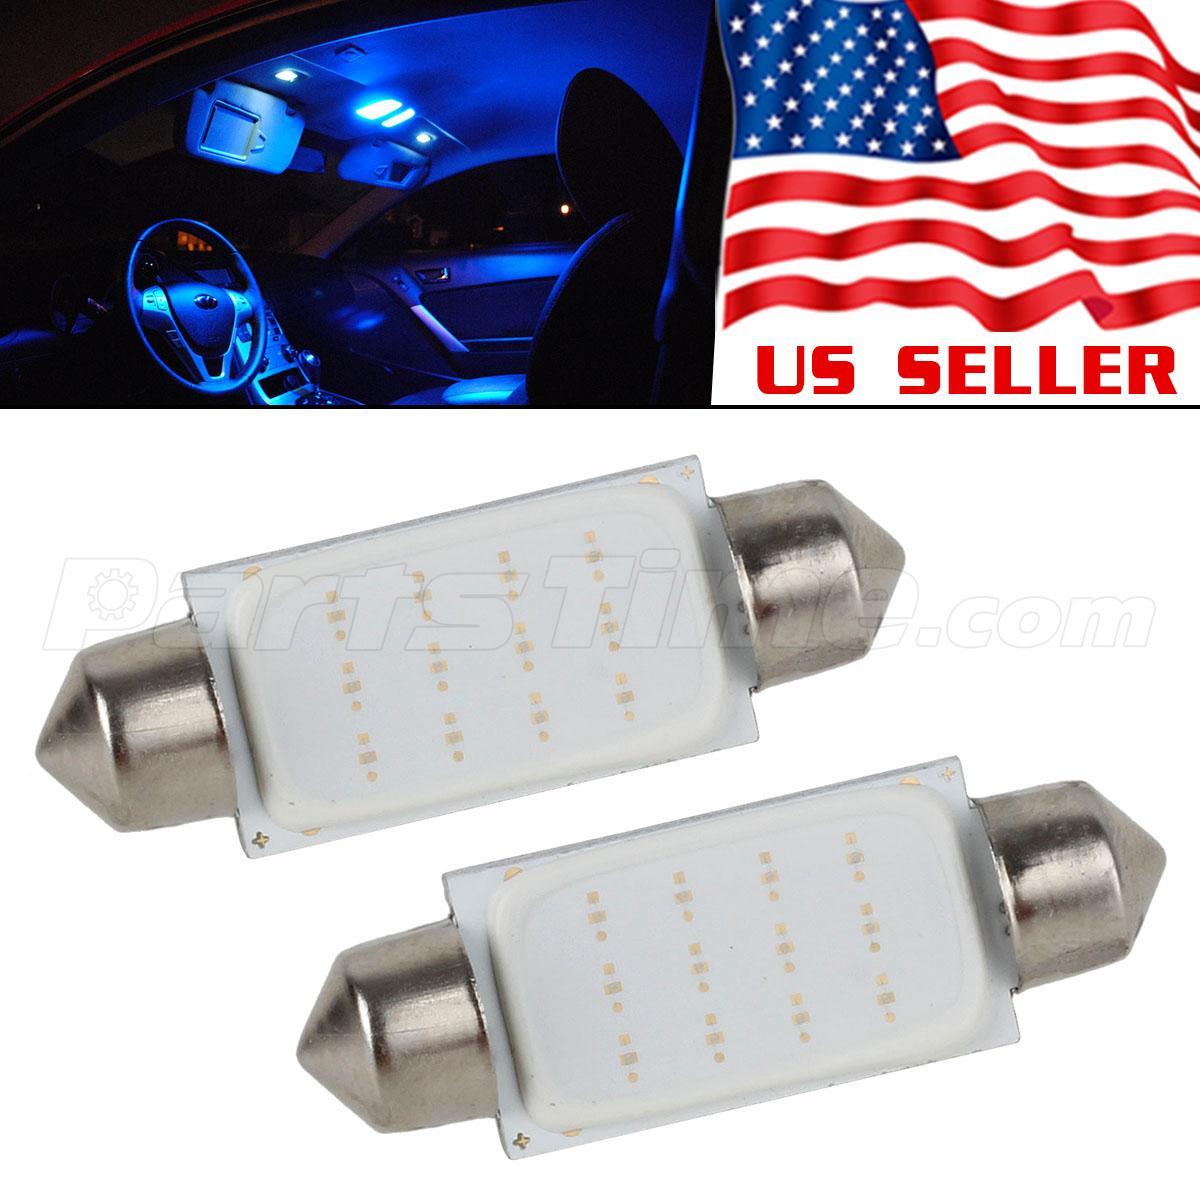 2pcs Blue Cob Led Lights 41 42 43mm Festoon Bulbs Interior Dome Map 578 12v Ebay